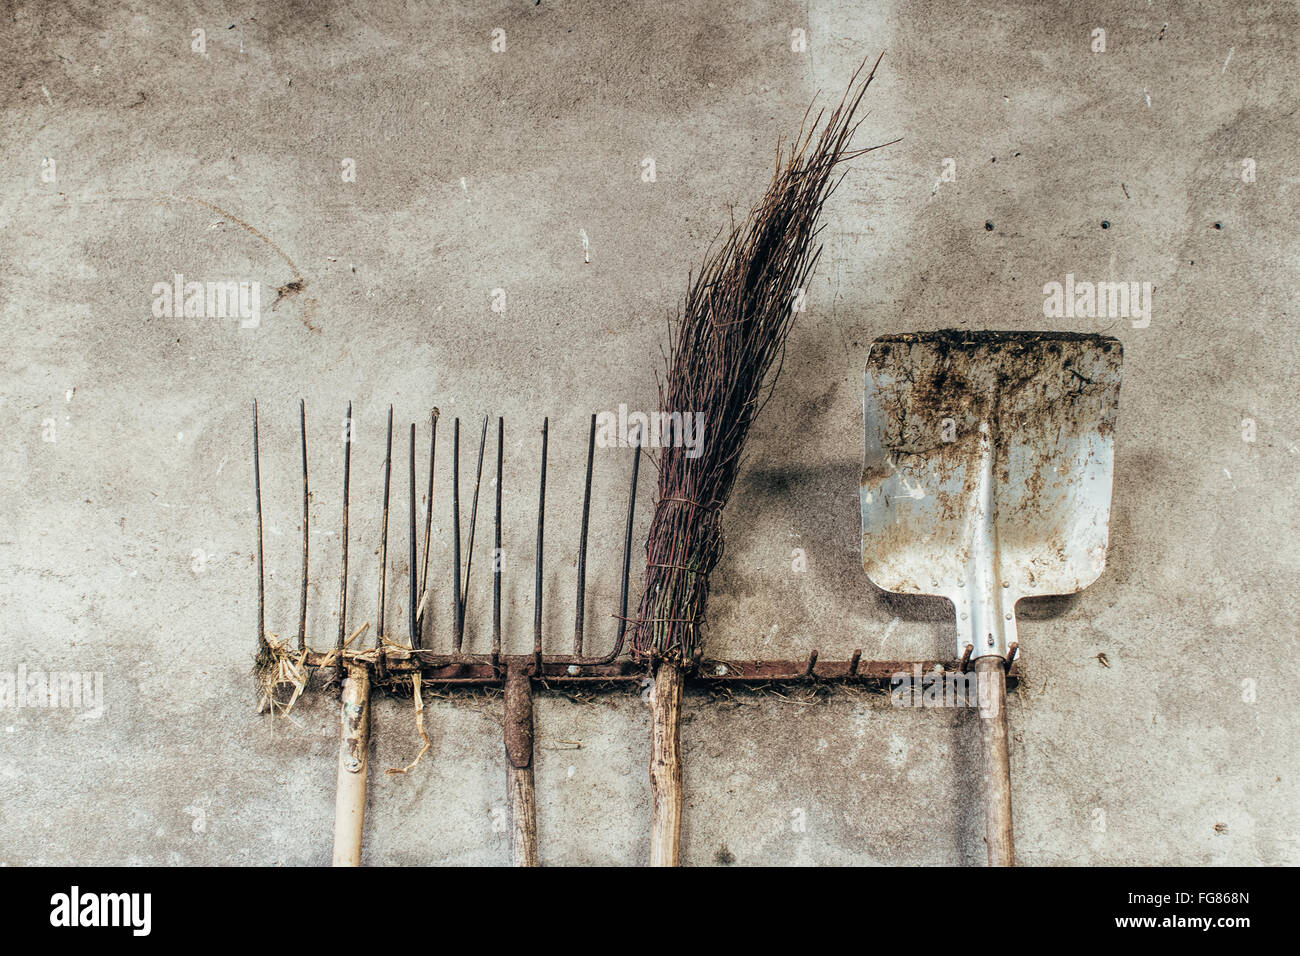 Gardening Equipment Hanging On Wall - Stock Image